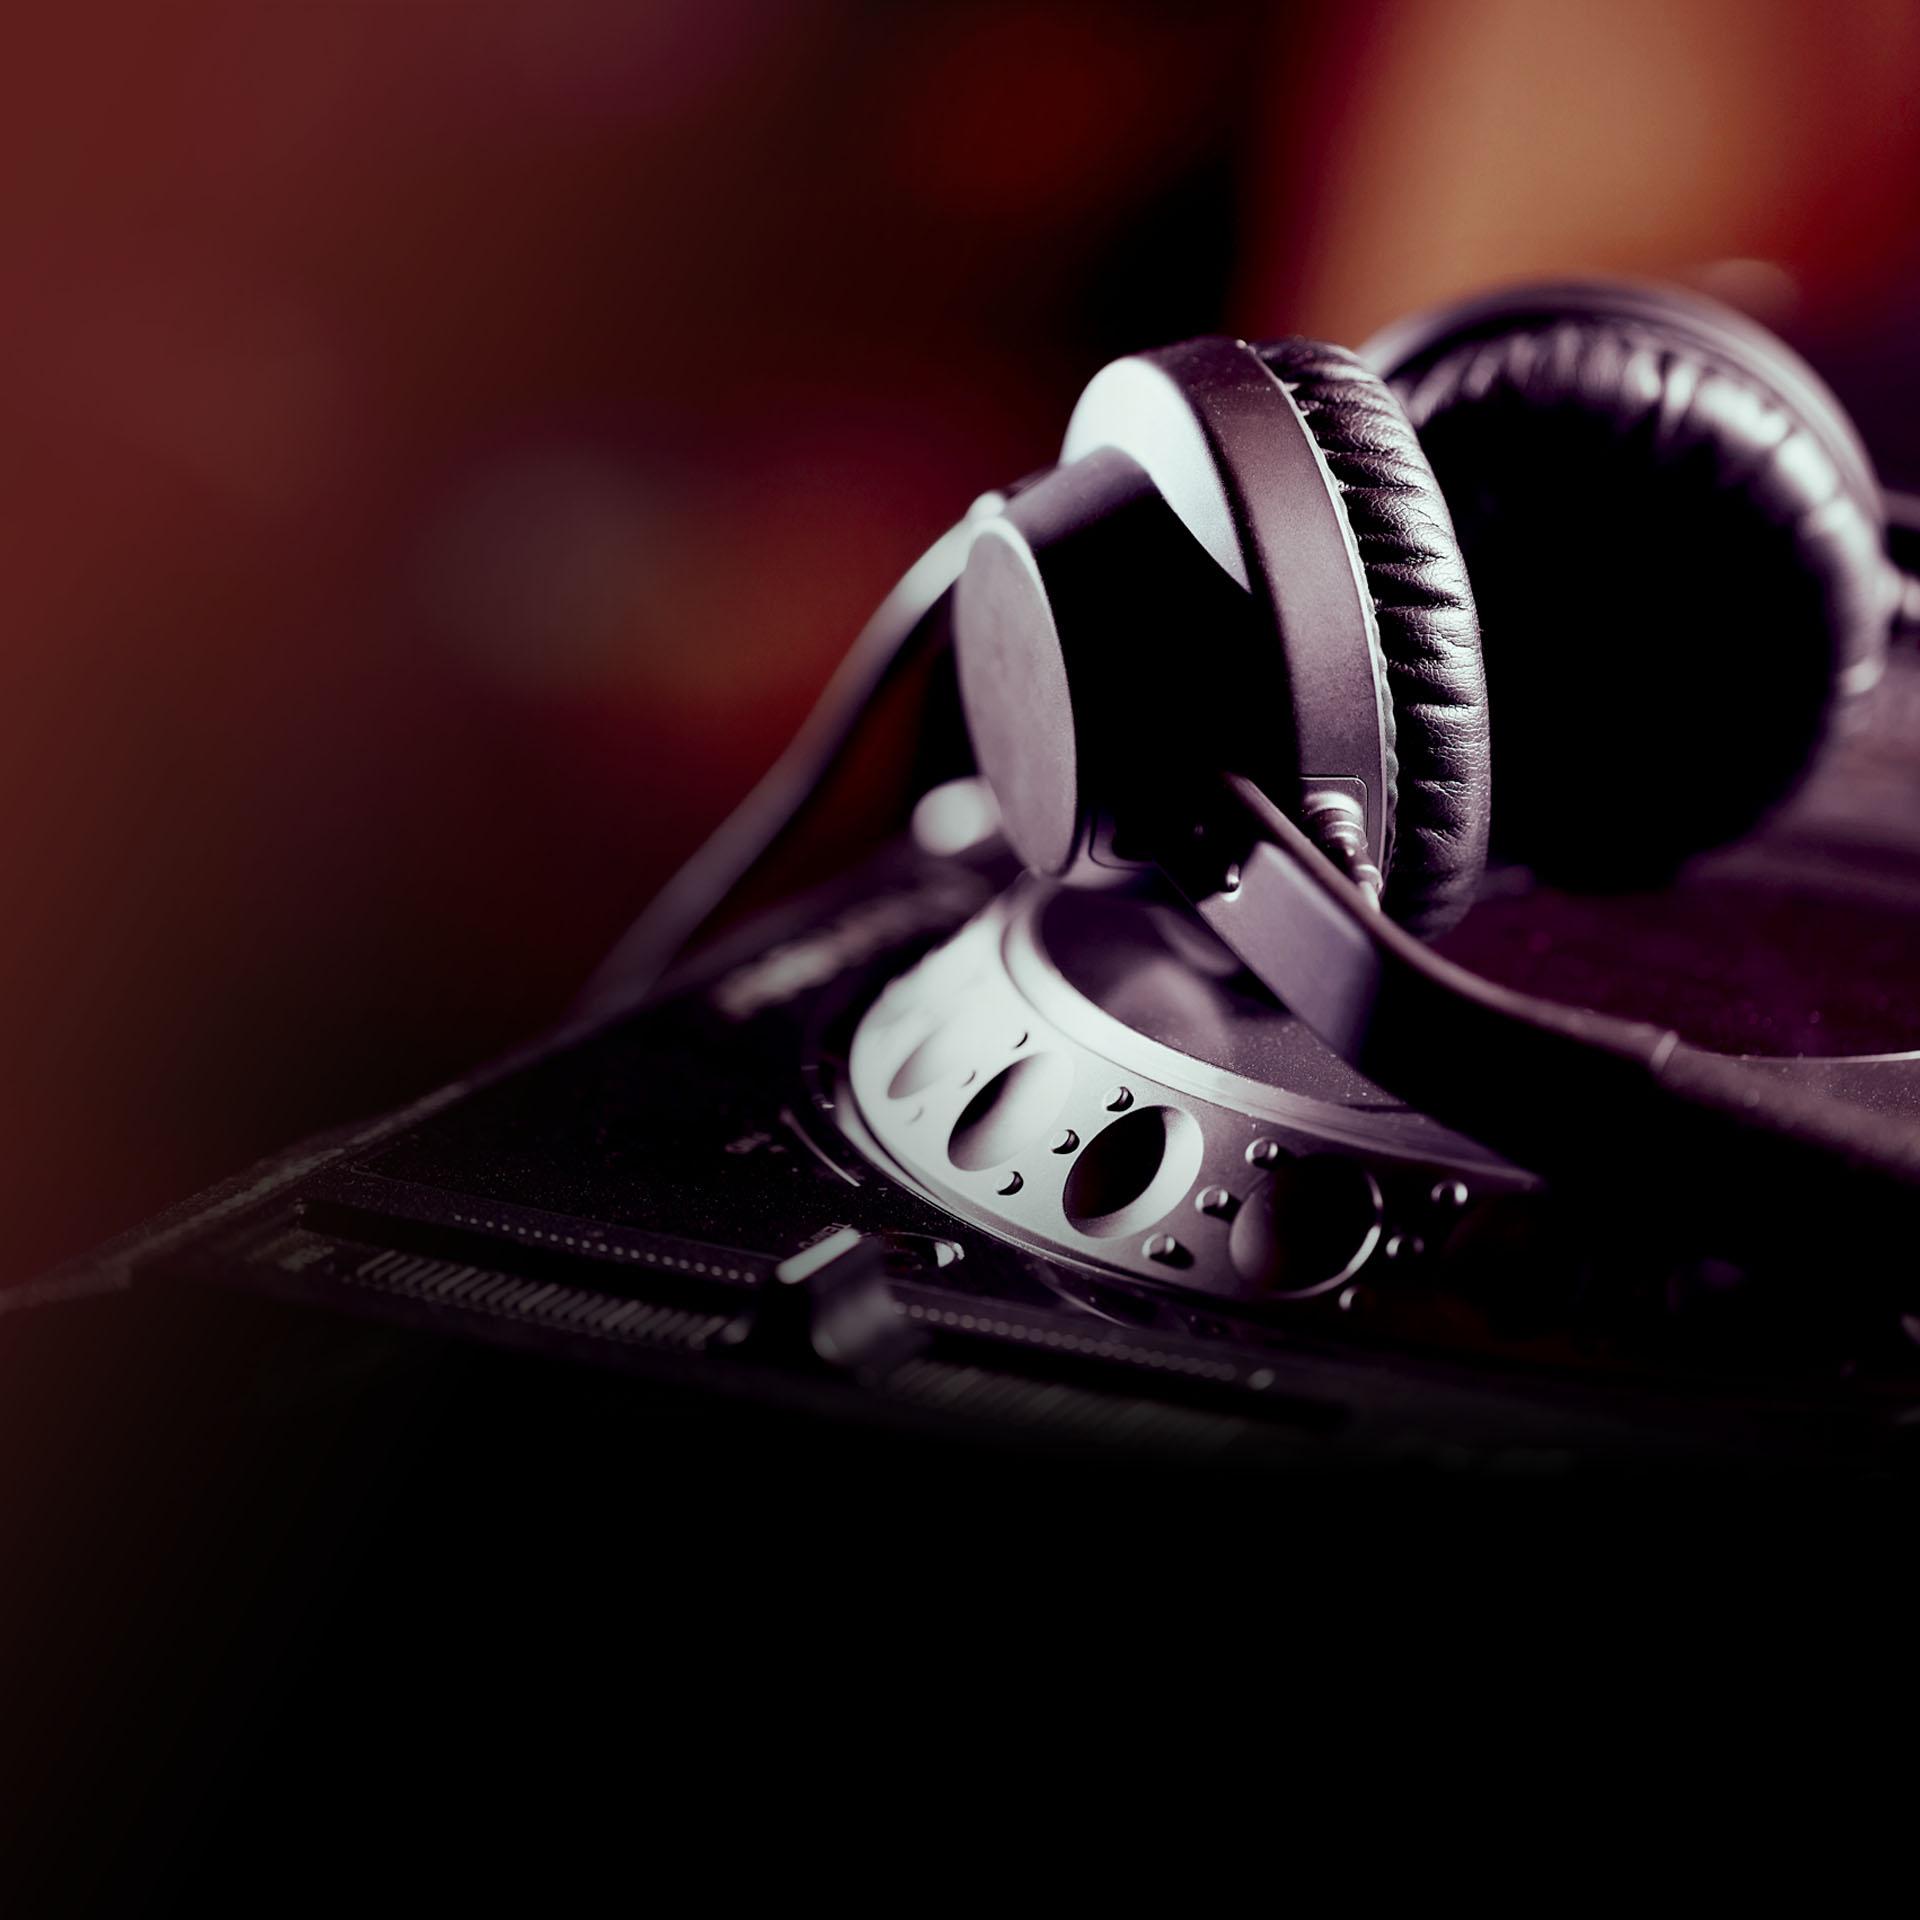 Guest DJs on E Street Radio